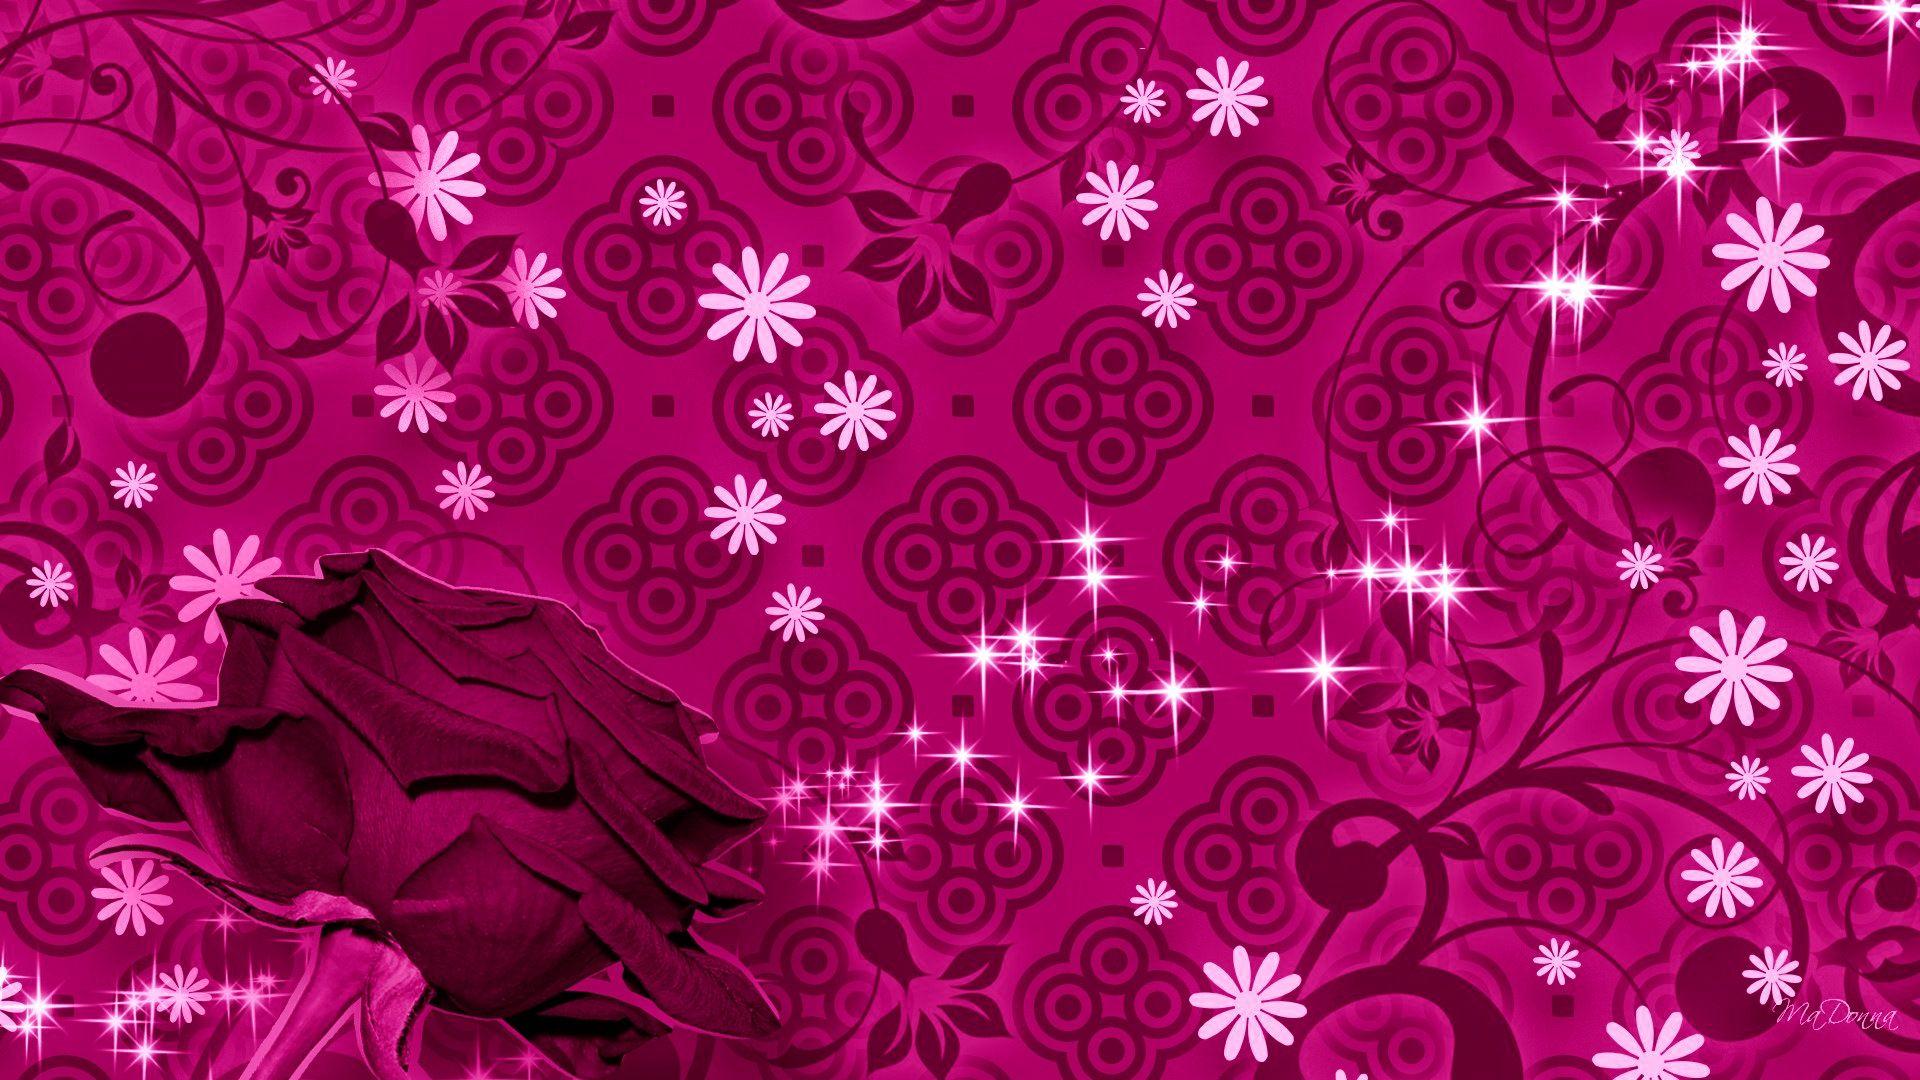 Rose dark pink hd pattern desktop wallpaper 3d hd for Pink 3d wallpaper